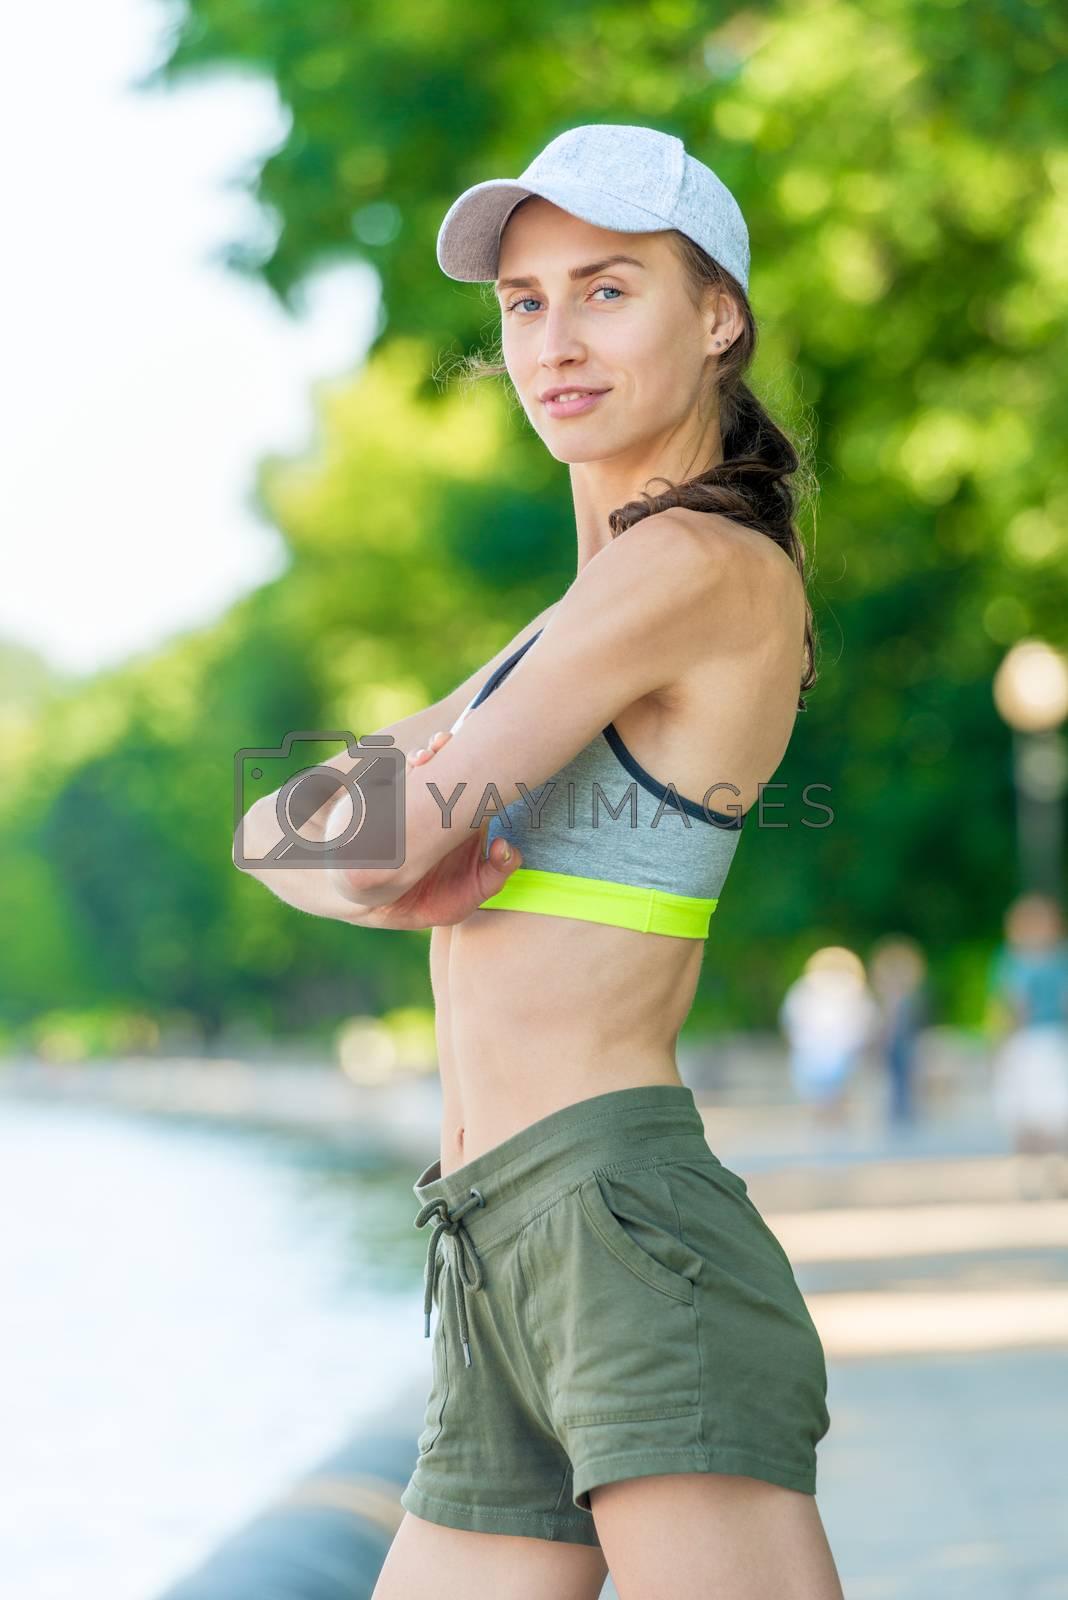 sporty girl posing closeup on city embankment by Labunskiy K.